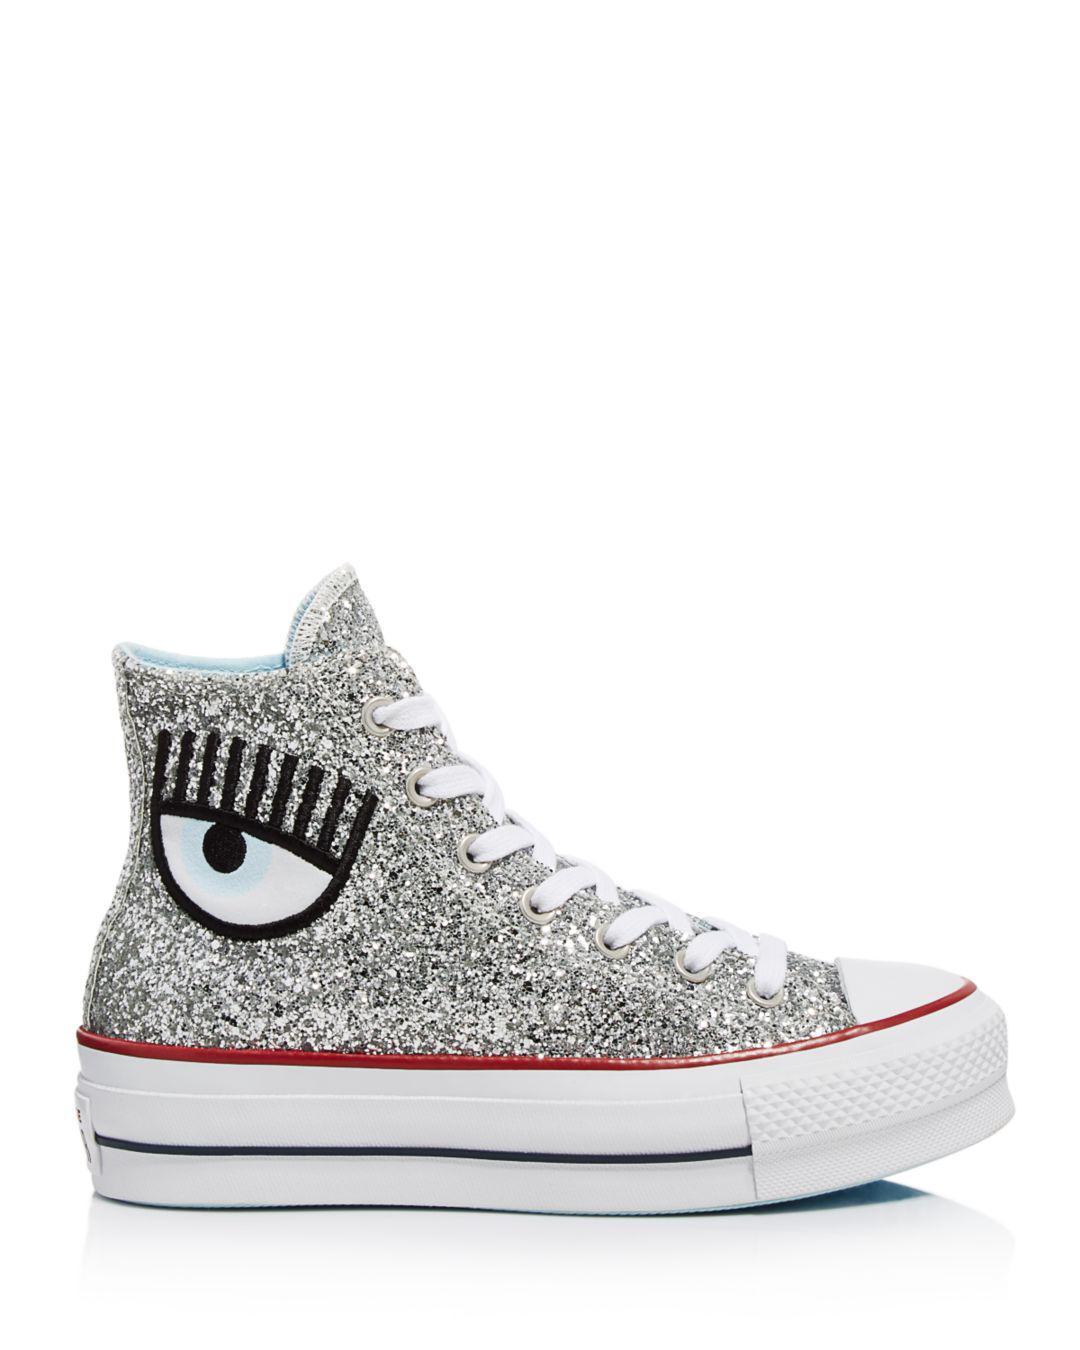 bcefa47673c Converse - Metallic X Chiara Ferragni Women s Chuck Taylor Glitter High Top  Sneakers - Lyst. View fullscreen